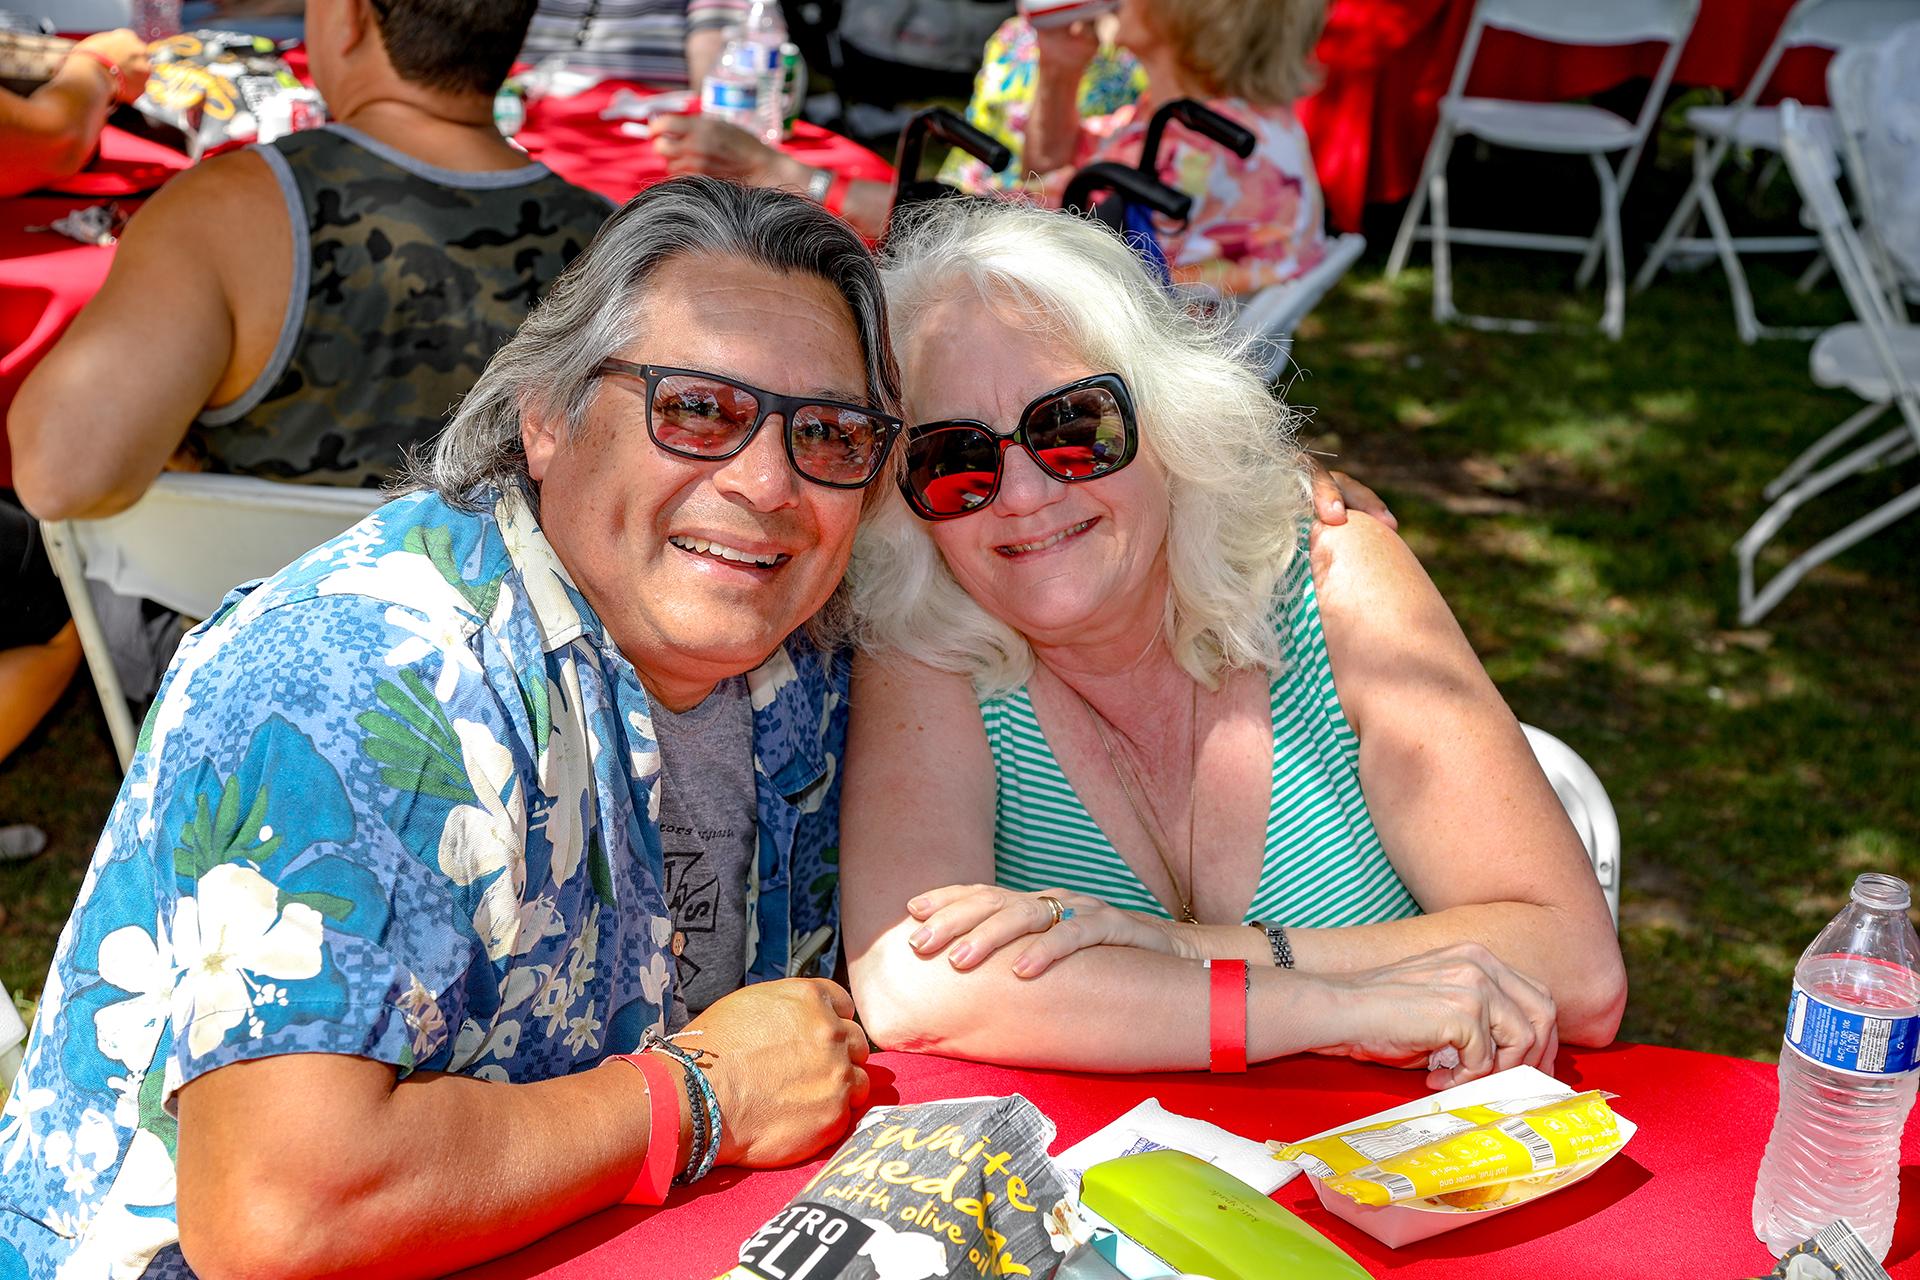 Glenn T. and Jennifer Morgan